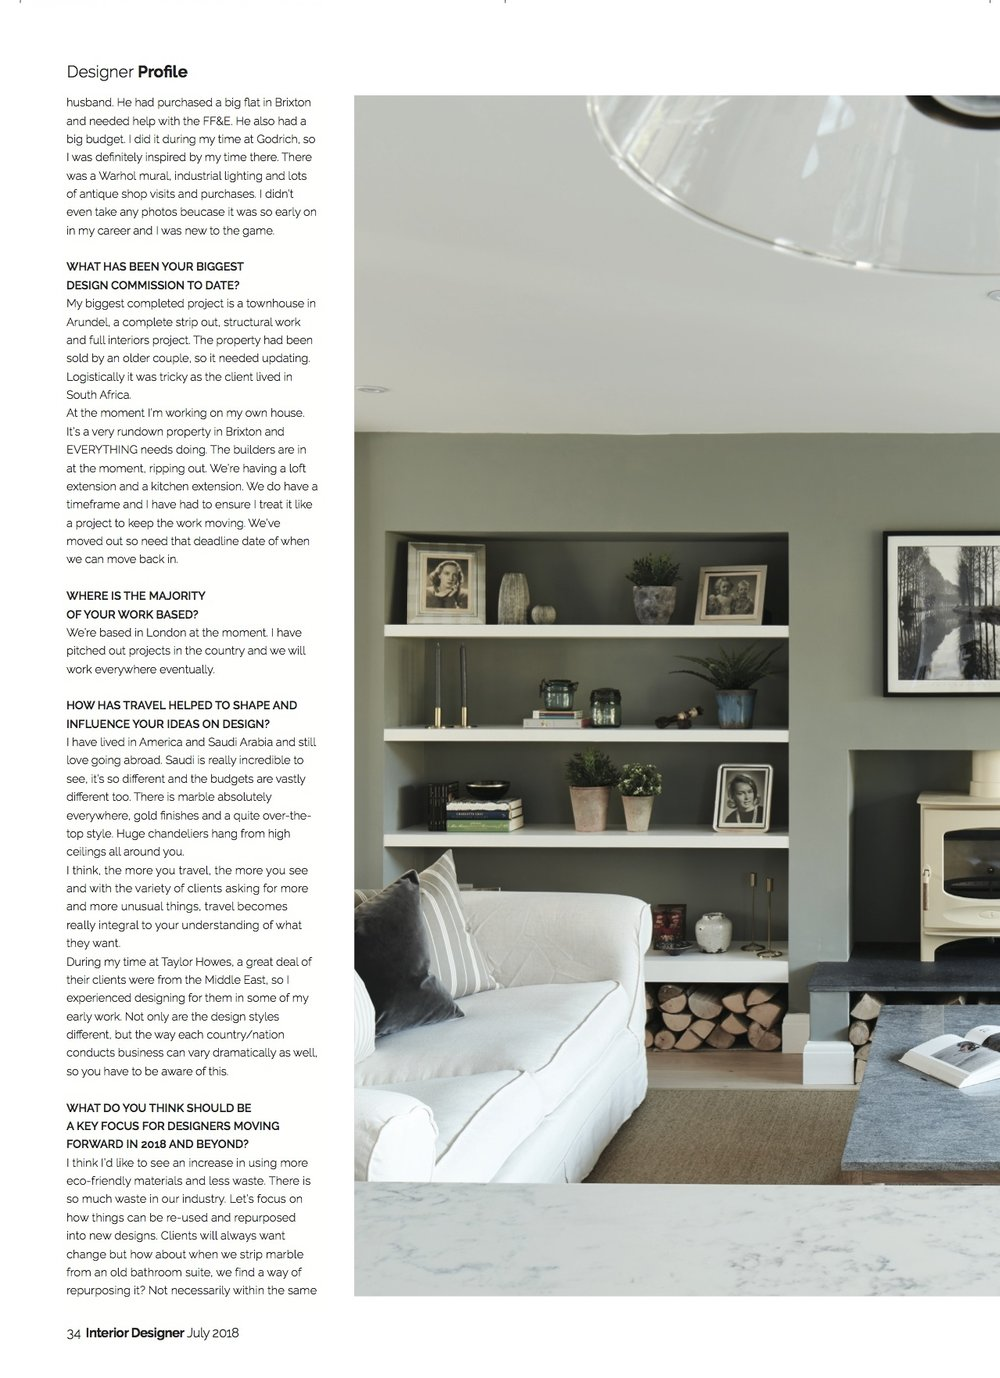 Interior Designer (3).jpg